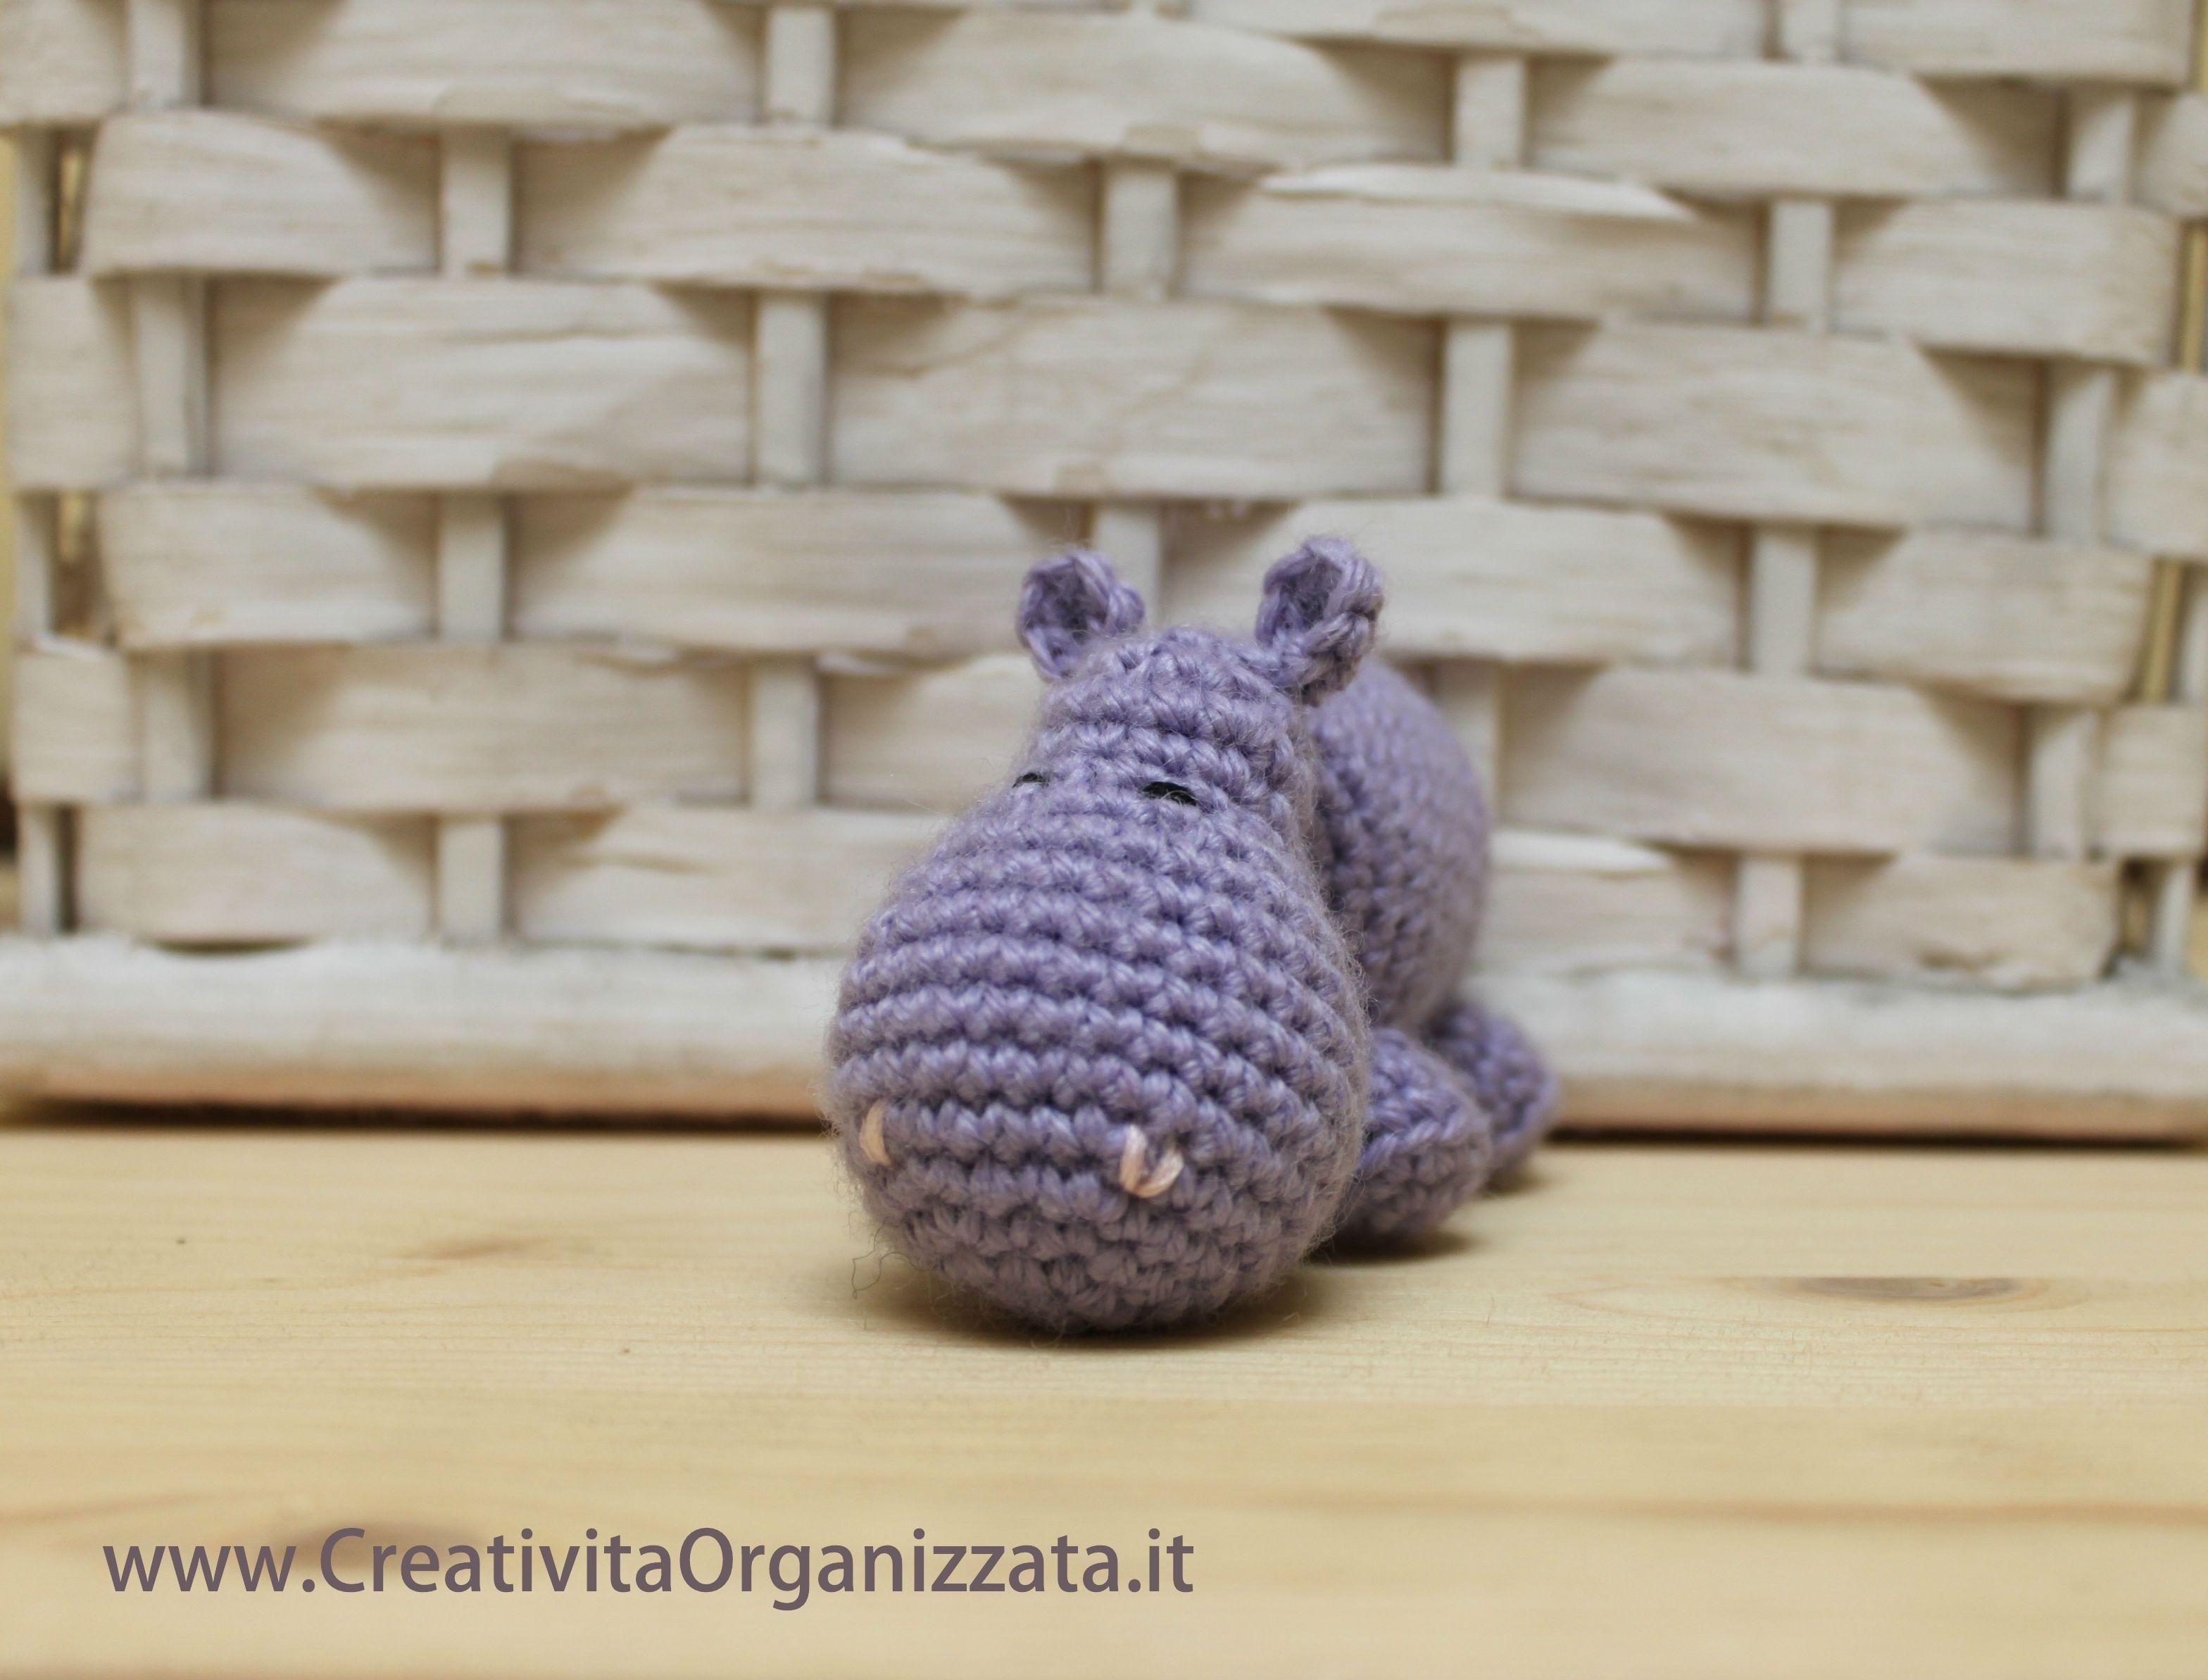 Amigurumi Knitting Tutorial : Snorlax amigurumi crochet tutorial part youtube